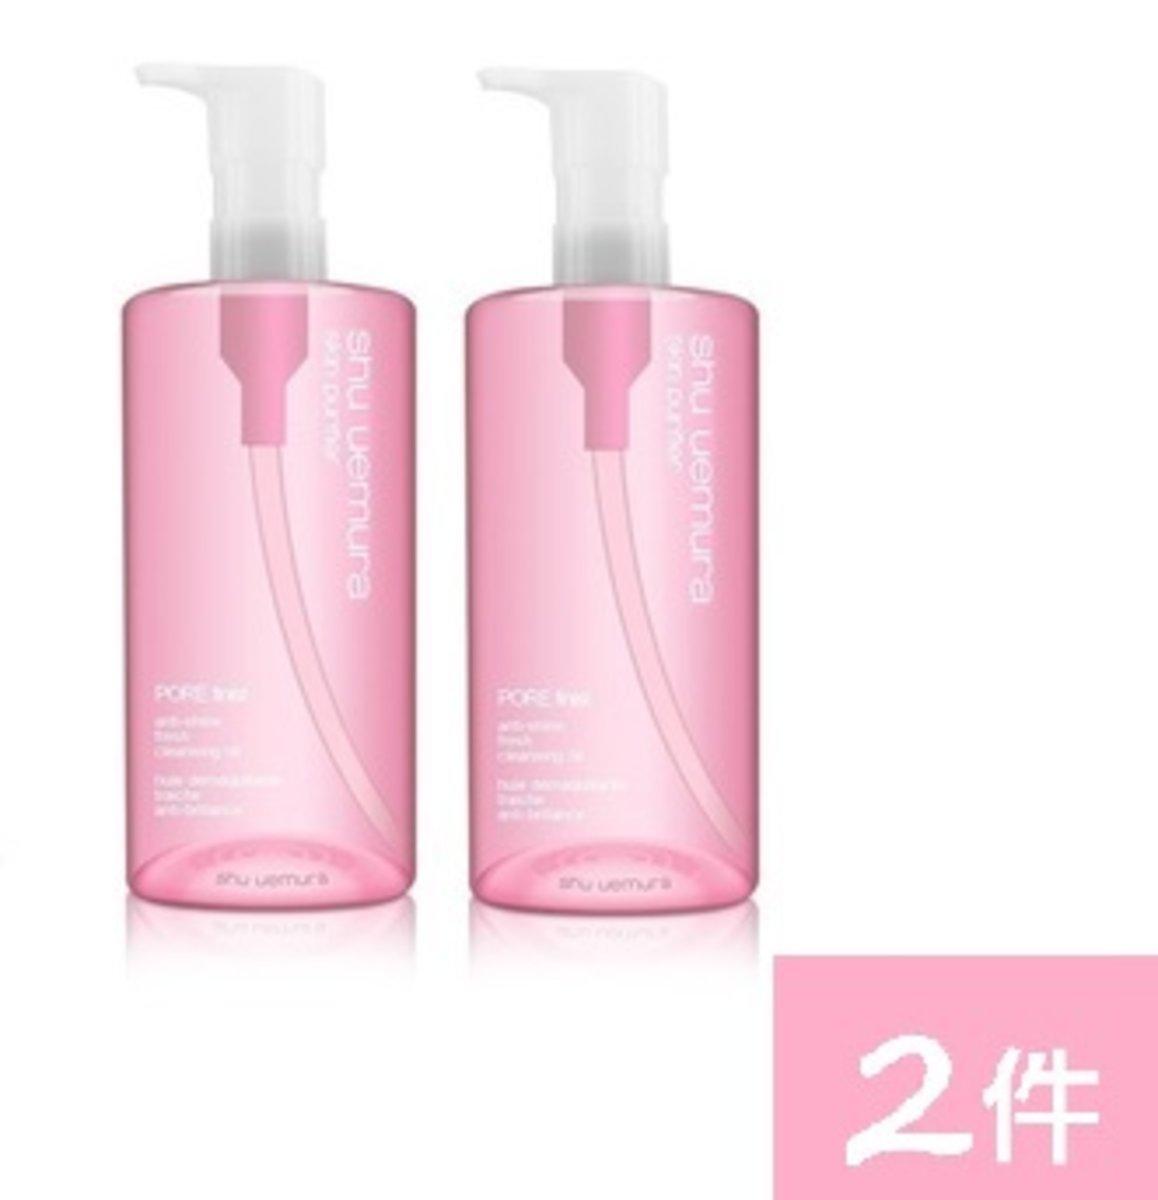 (2pcs) Skin Purifier POREfinist² Sakura Refreshing Cleansing Oil 450ml x 2pcs (4935421652193) (Parallel Import goods)